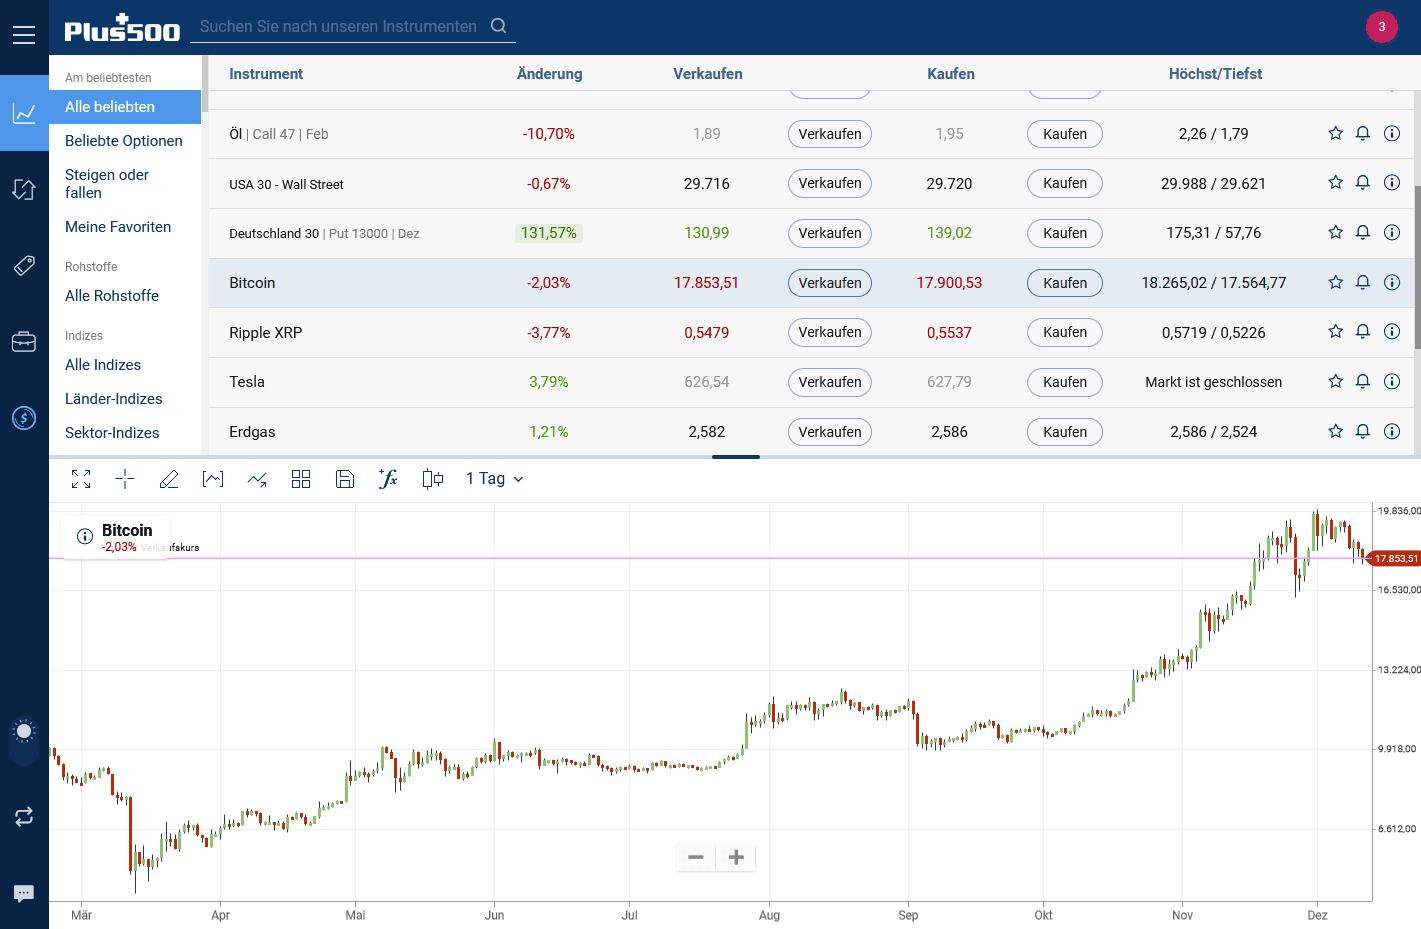 Screenshot der Handelsoberfläche des Plus500 Krypto Brokers